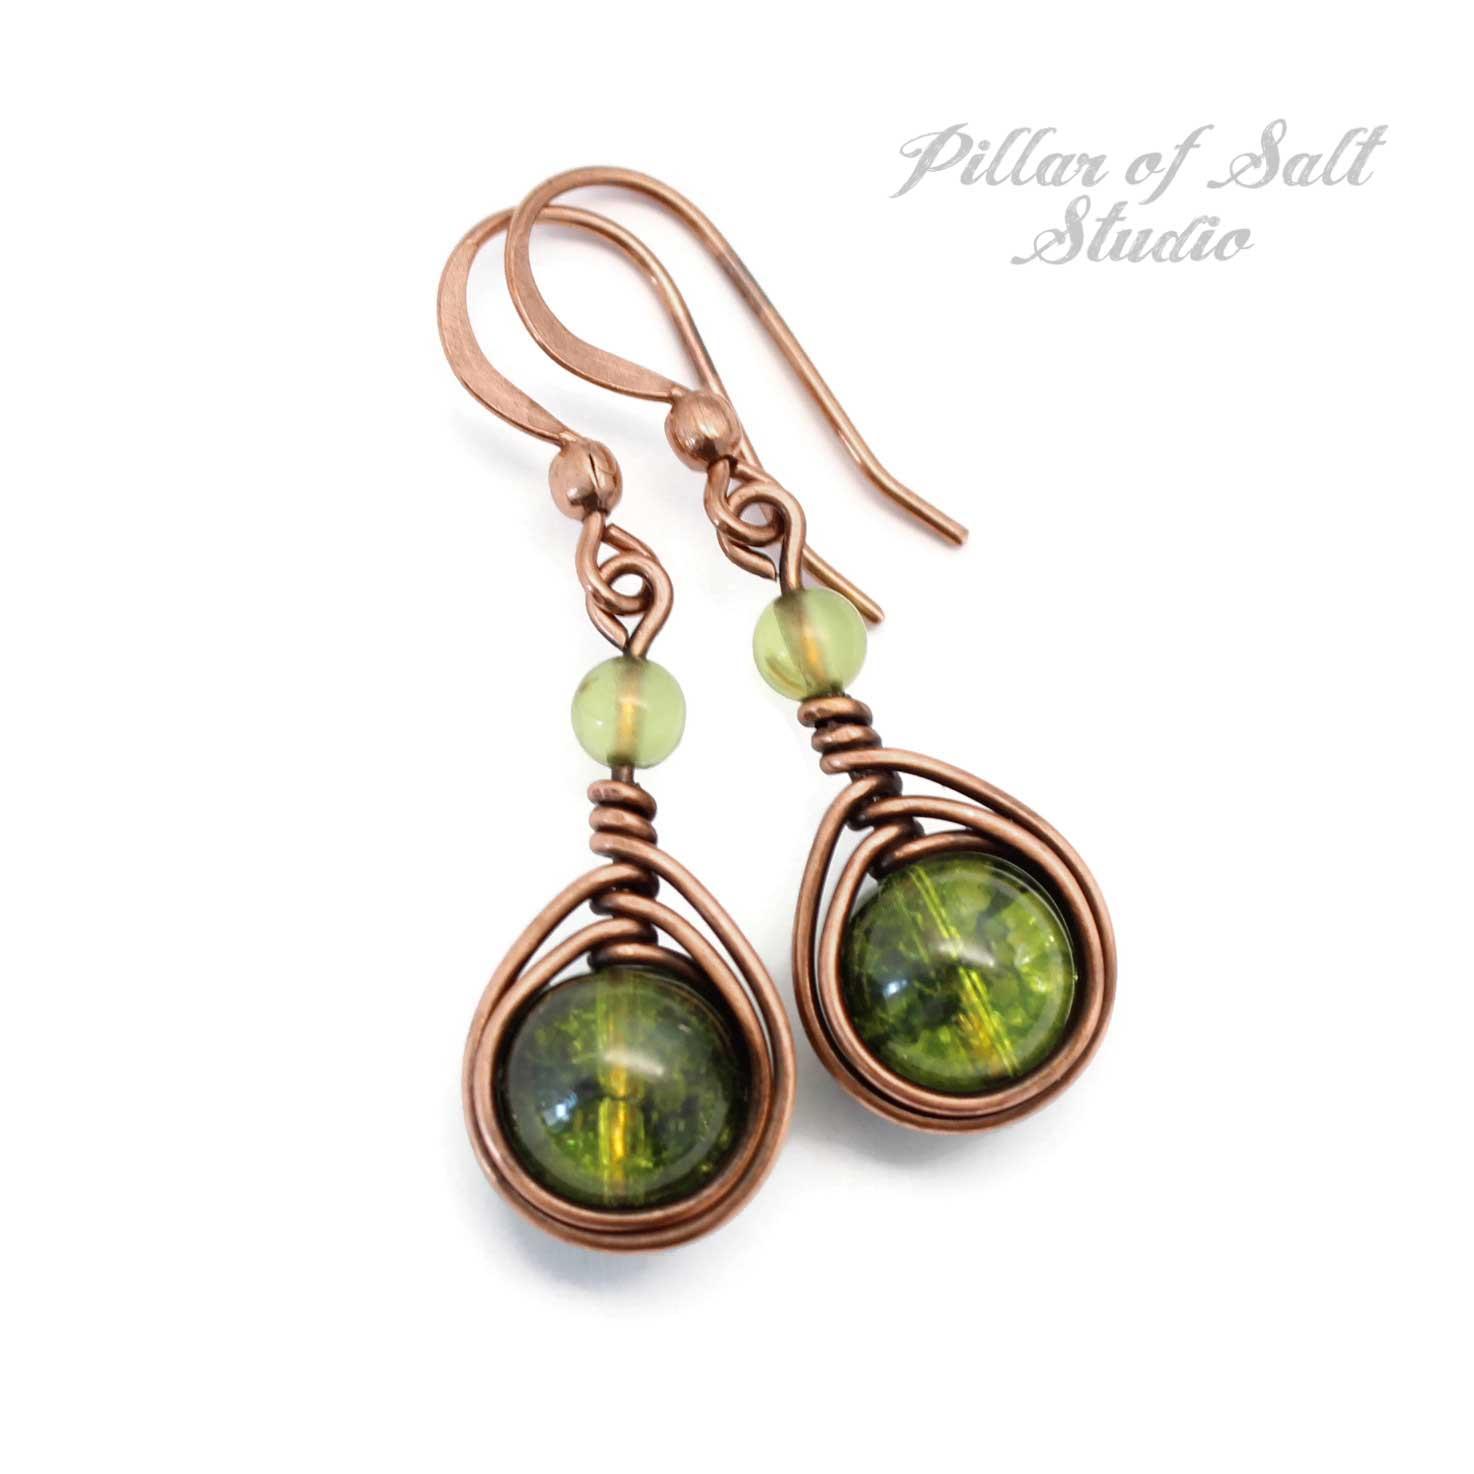 Green Peridot August birthstone earrings